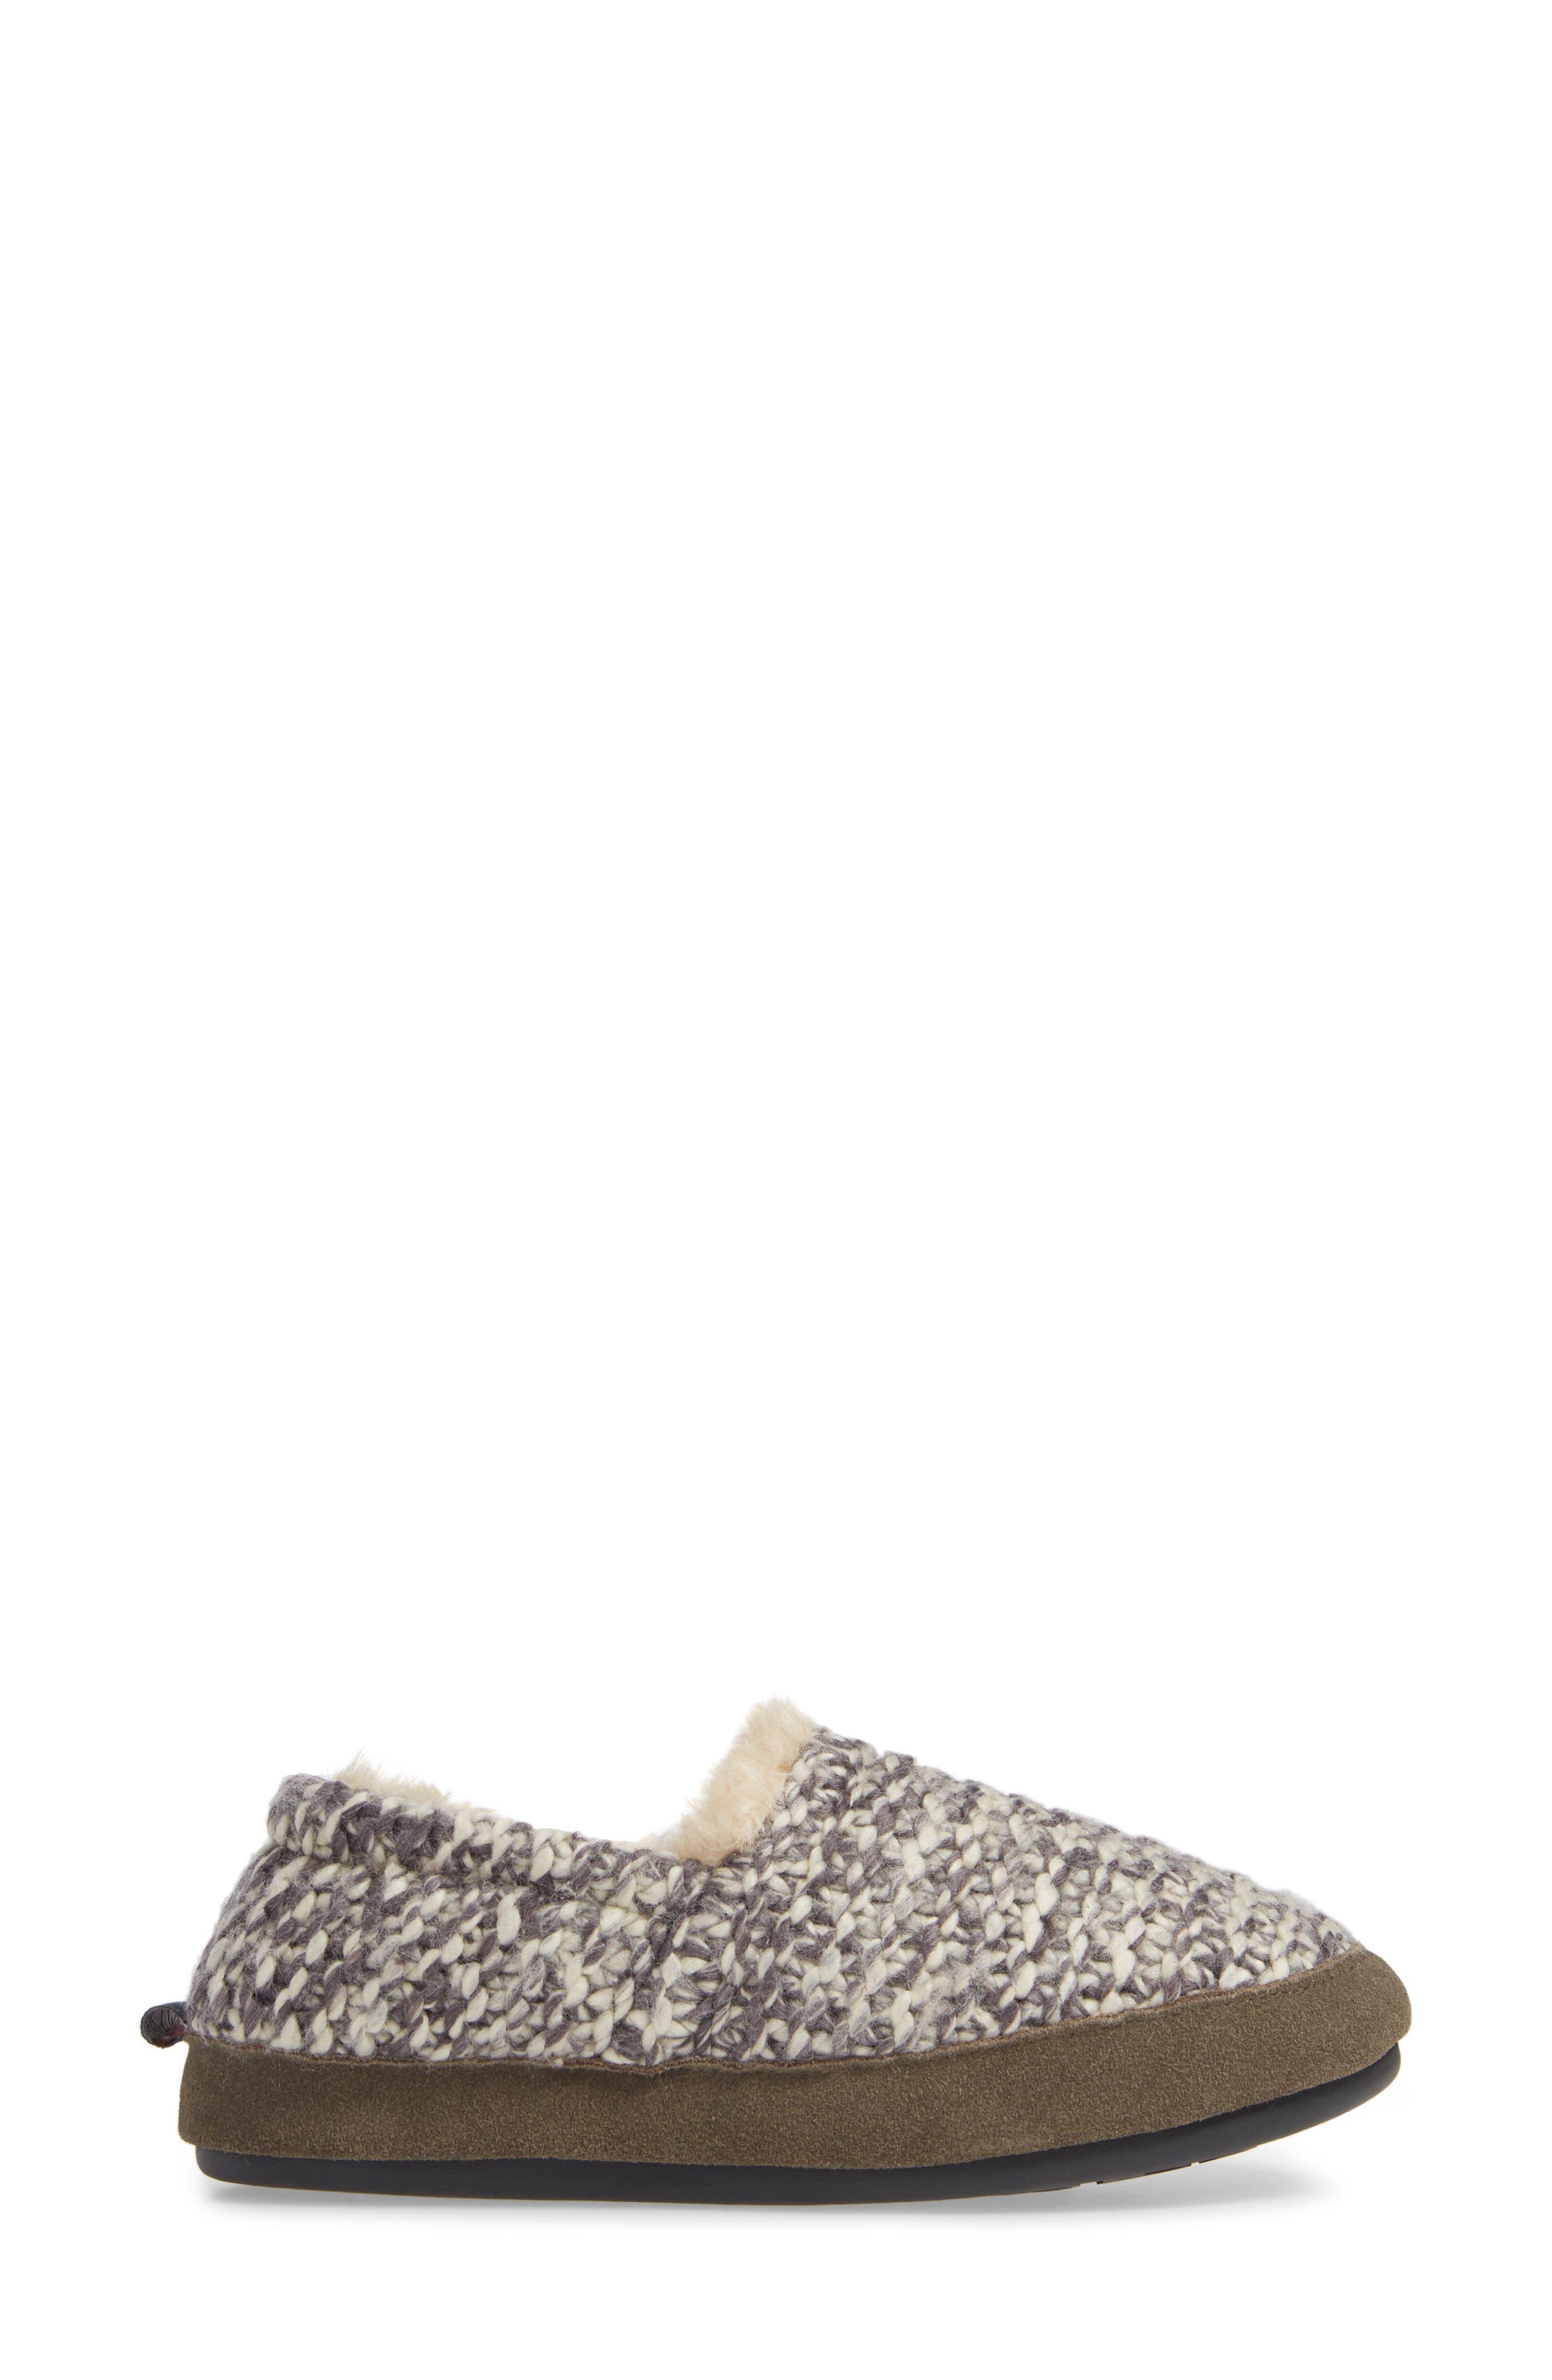 Whitecap Knit Slipper,                             Alternate thumbnail 3, color,                             WARM NEUTRAL FABRIC